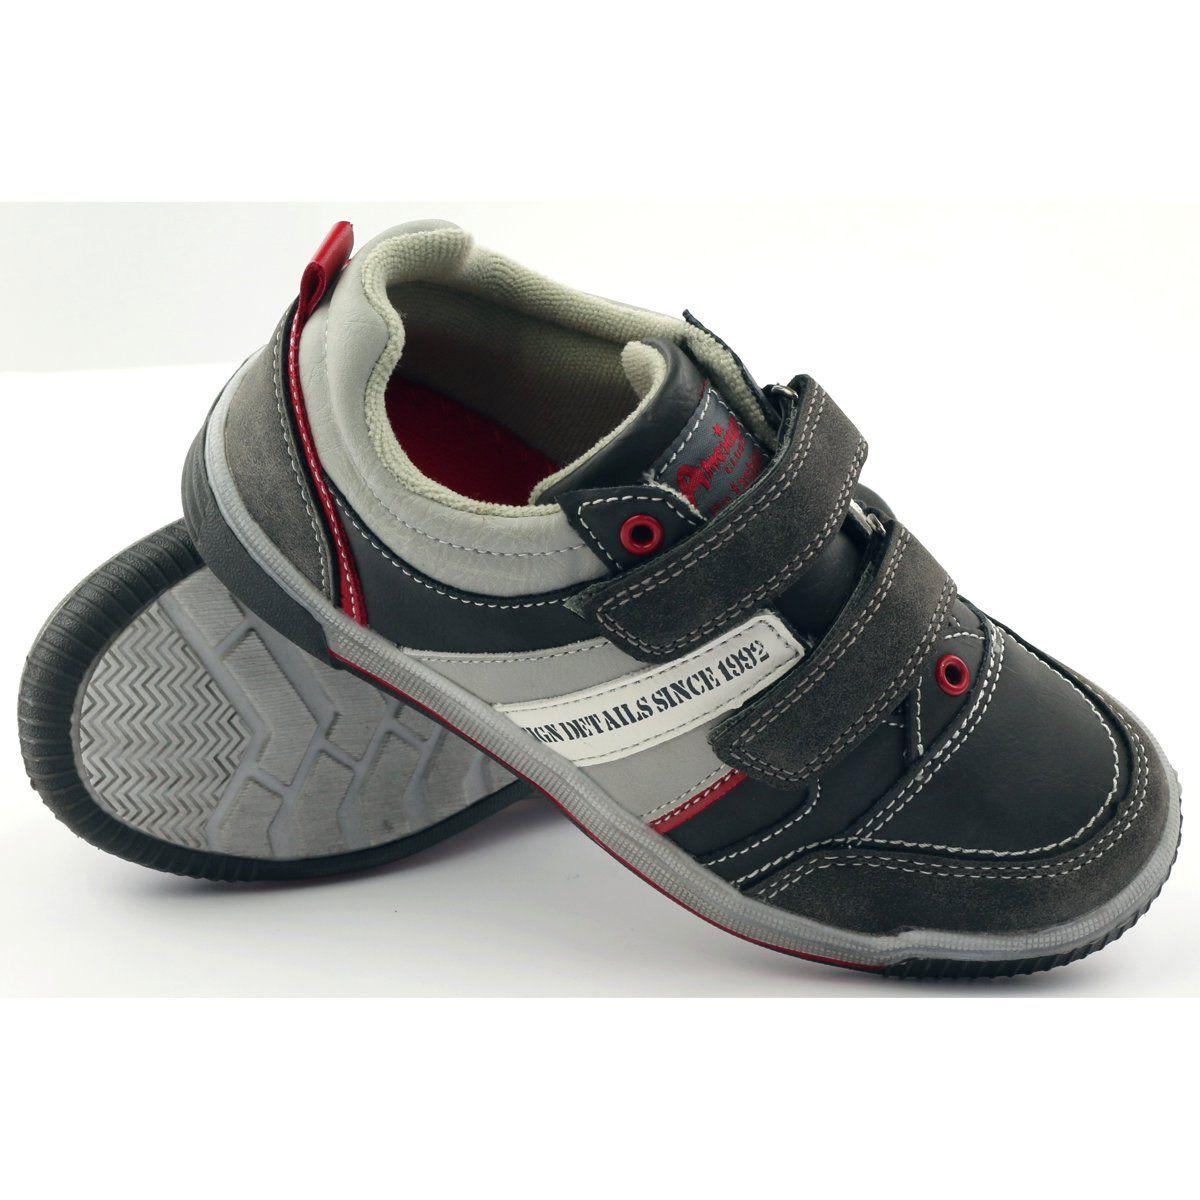 American Club Adi Buty Dzieciece Sportowe Na Rzepy American 152625 Szare Calzado Ninos Calzas Ninos